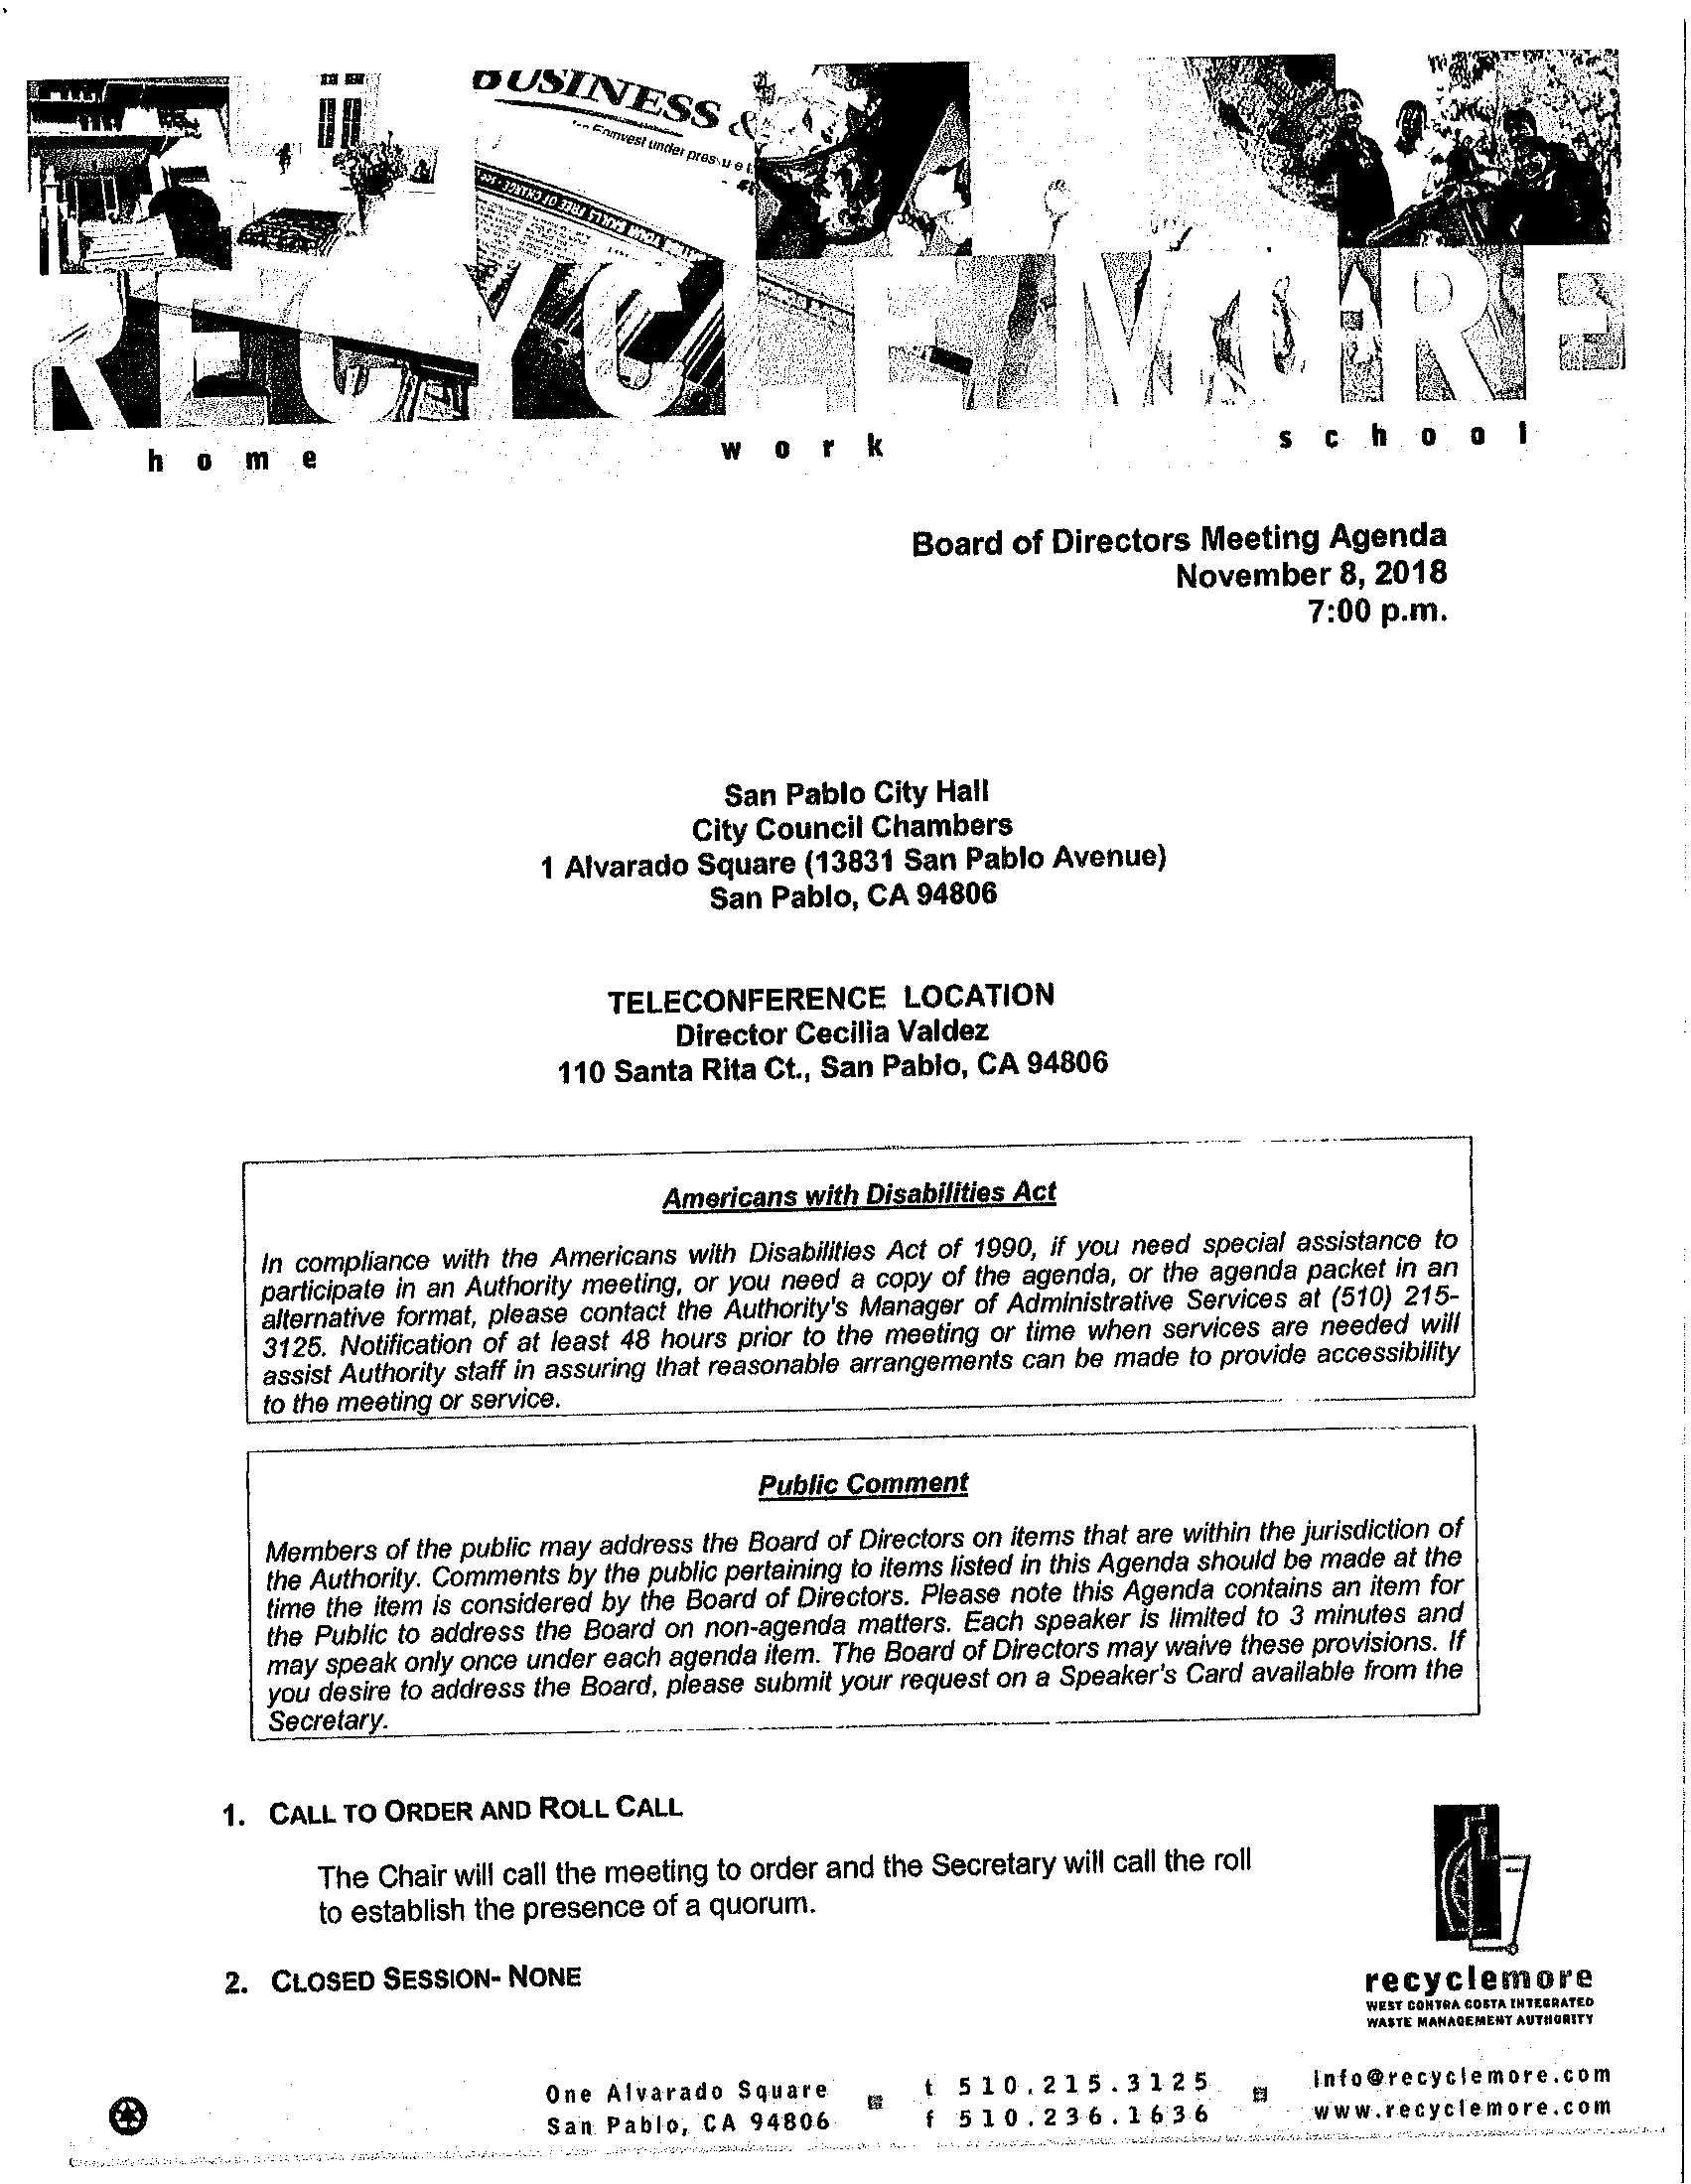 ESMAC Agenda 11.14.2018 (46 Pages)_32.jpg